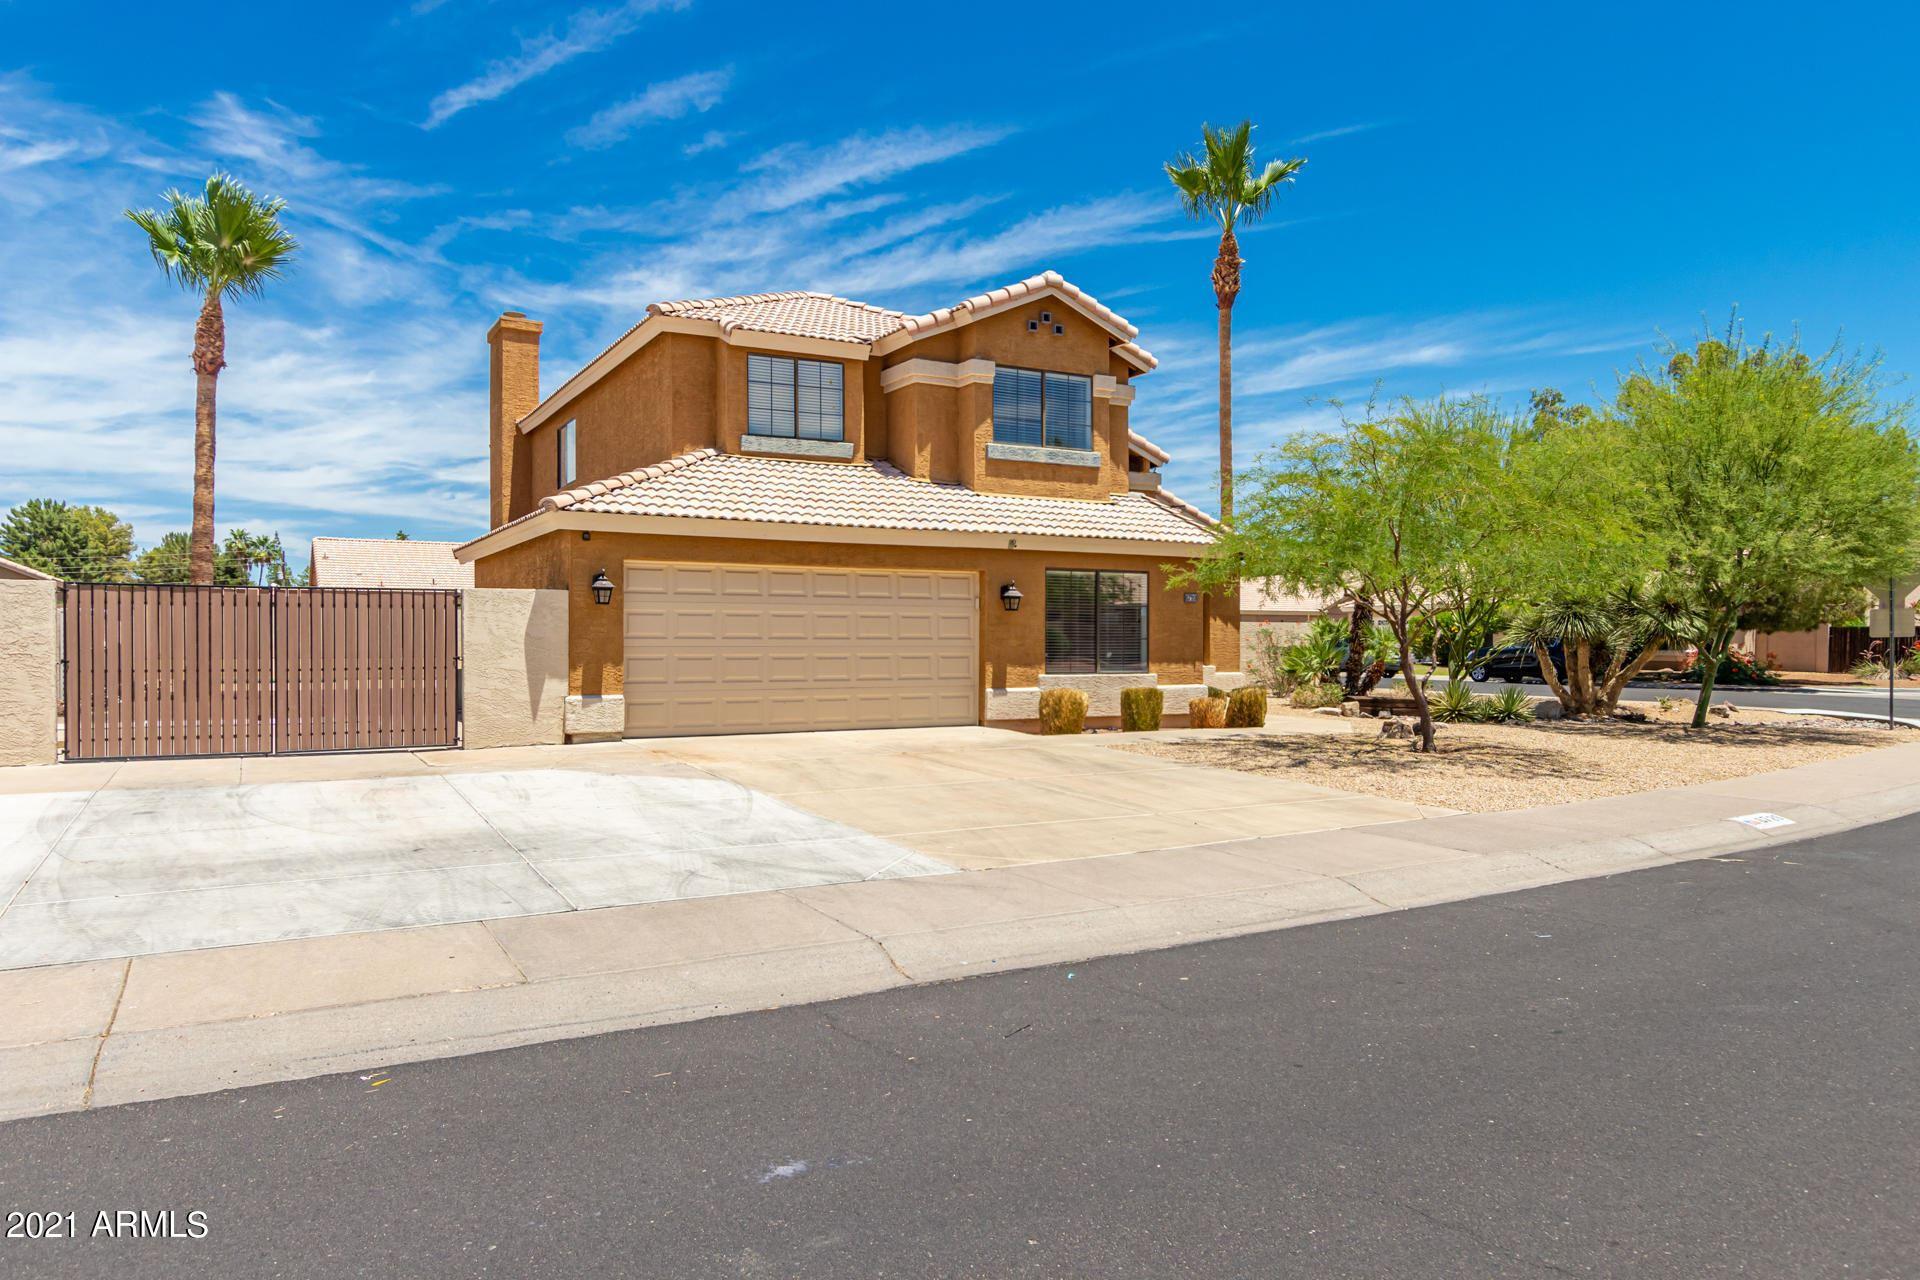 Photo of 6720 W BLOOMFIELD Road, Peoria, AZ 85381 (MLS # 6249635)